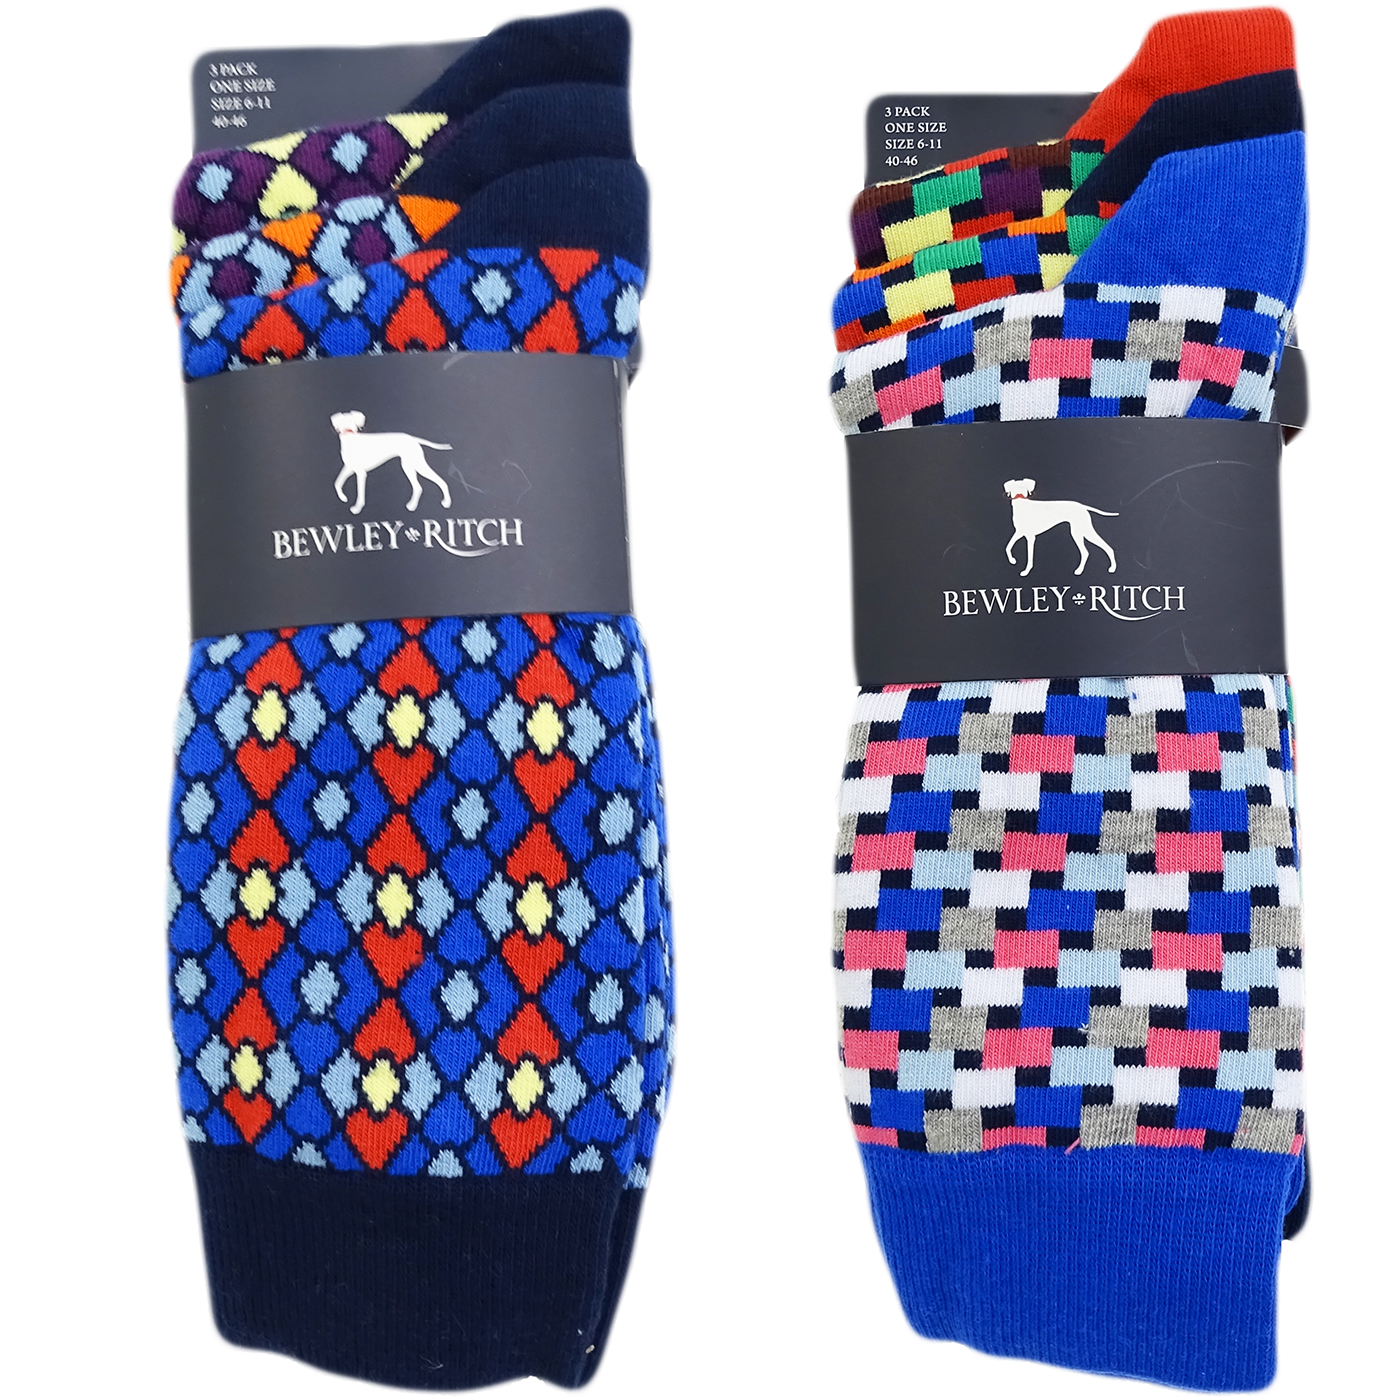 Bewley & Ritch One Size Socks - Sock Multi